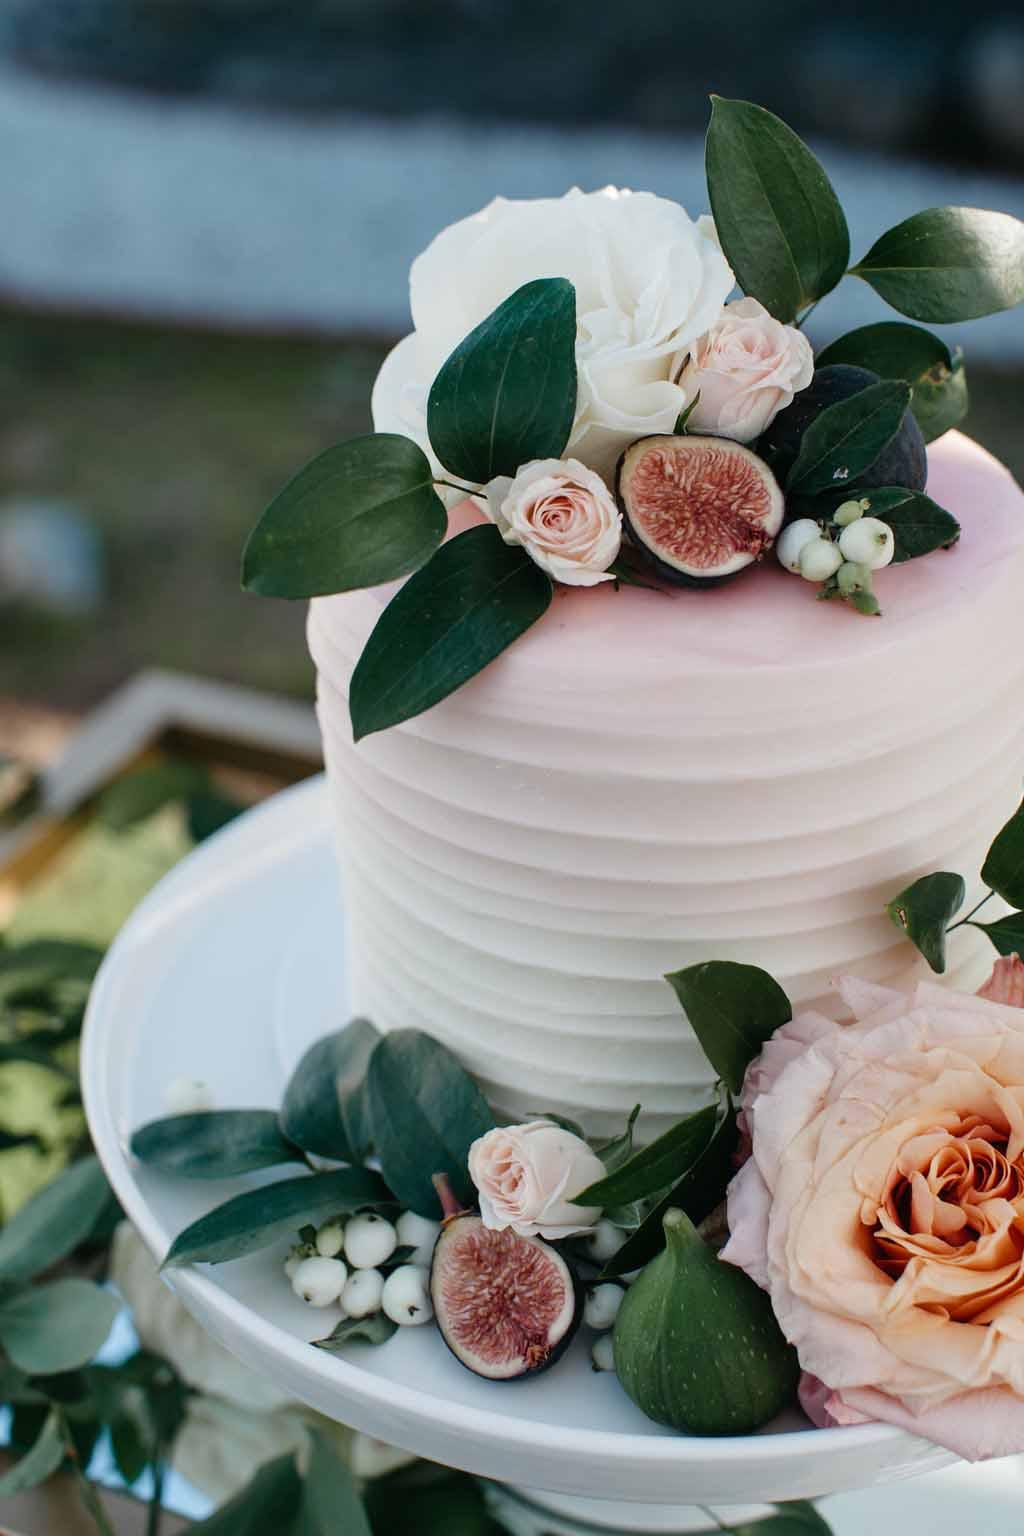 Wedding cake decorated with fruit, flowers, and greenery - Elegant Seattle Garden Wedding by Flora Nova Design Seattle